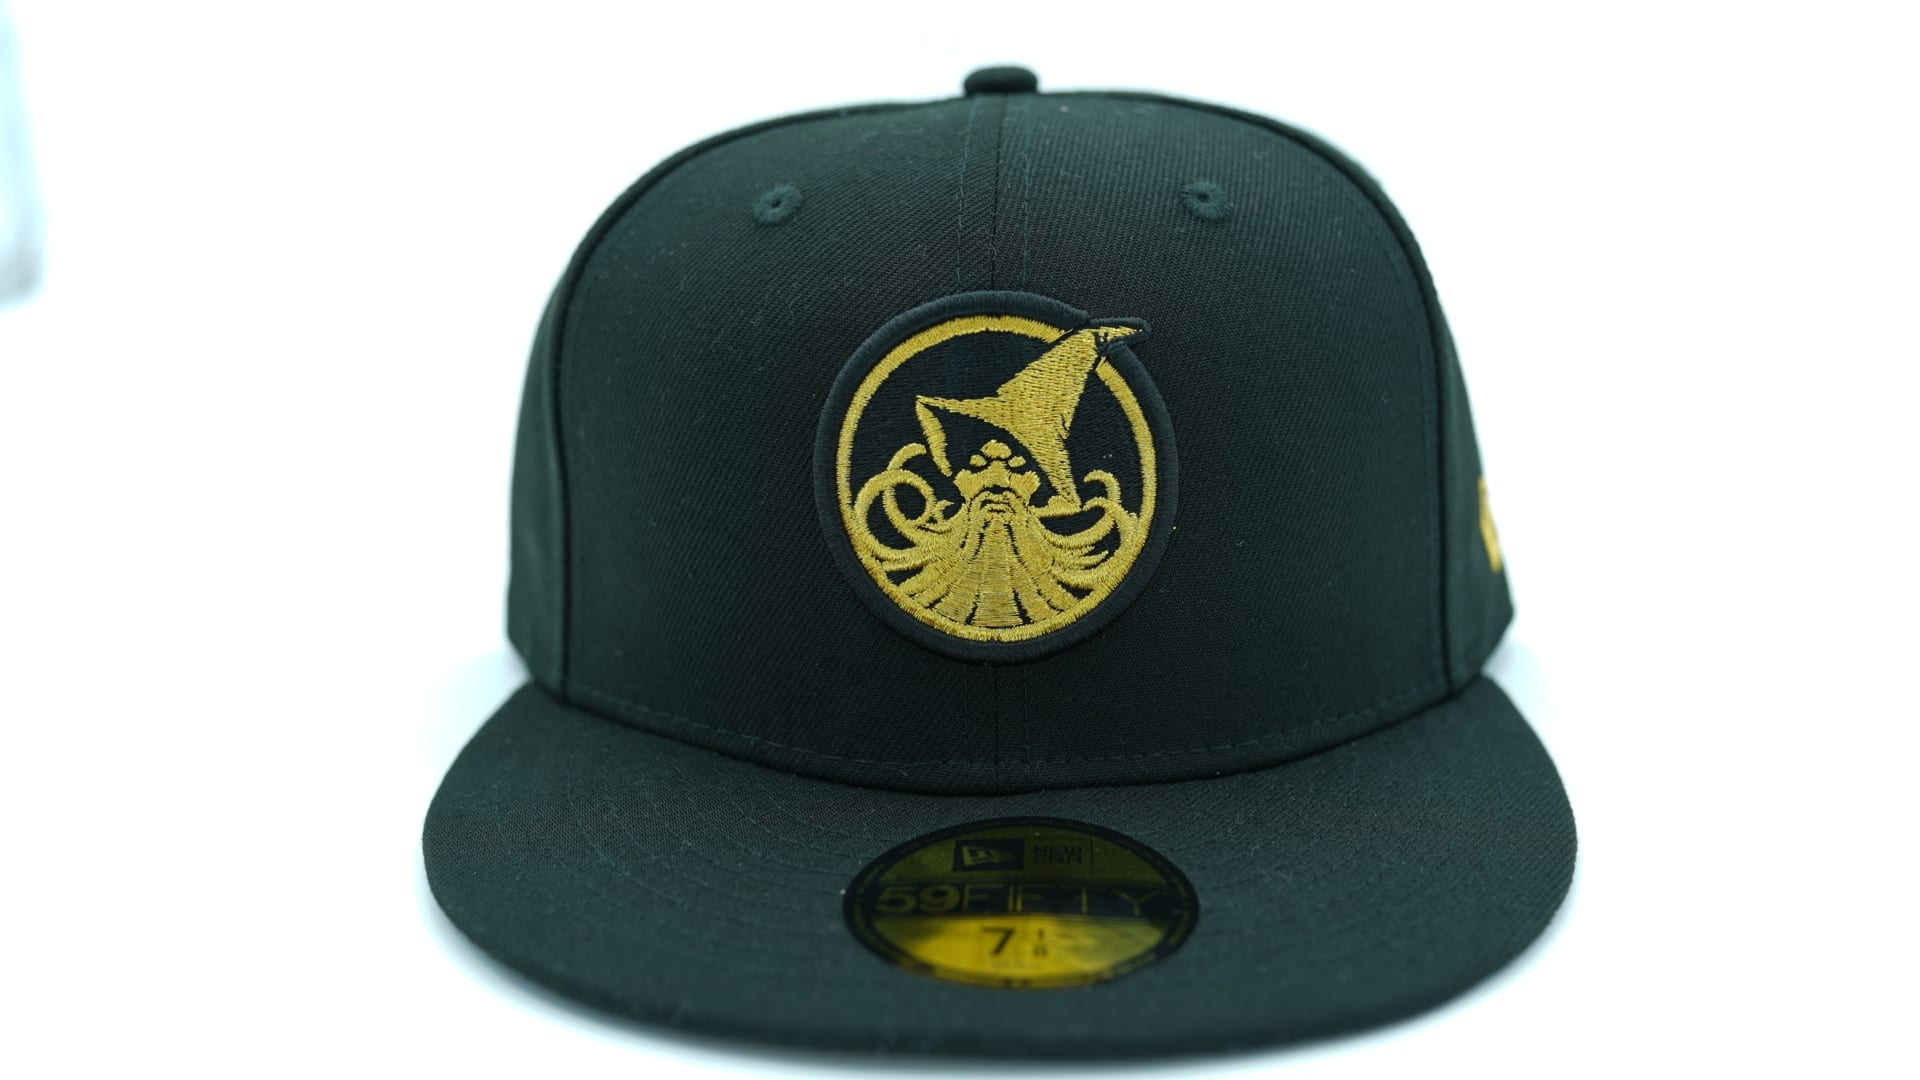 orlando magic hwc franchise fitted baseball cap 47 brand nba